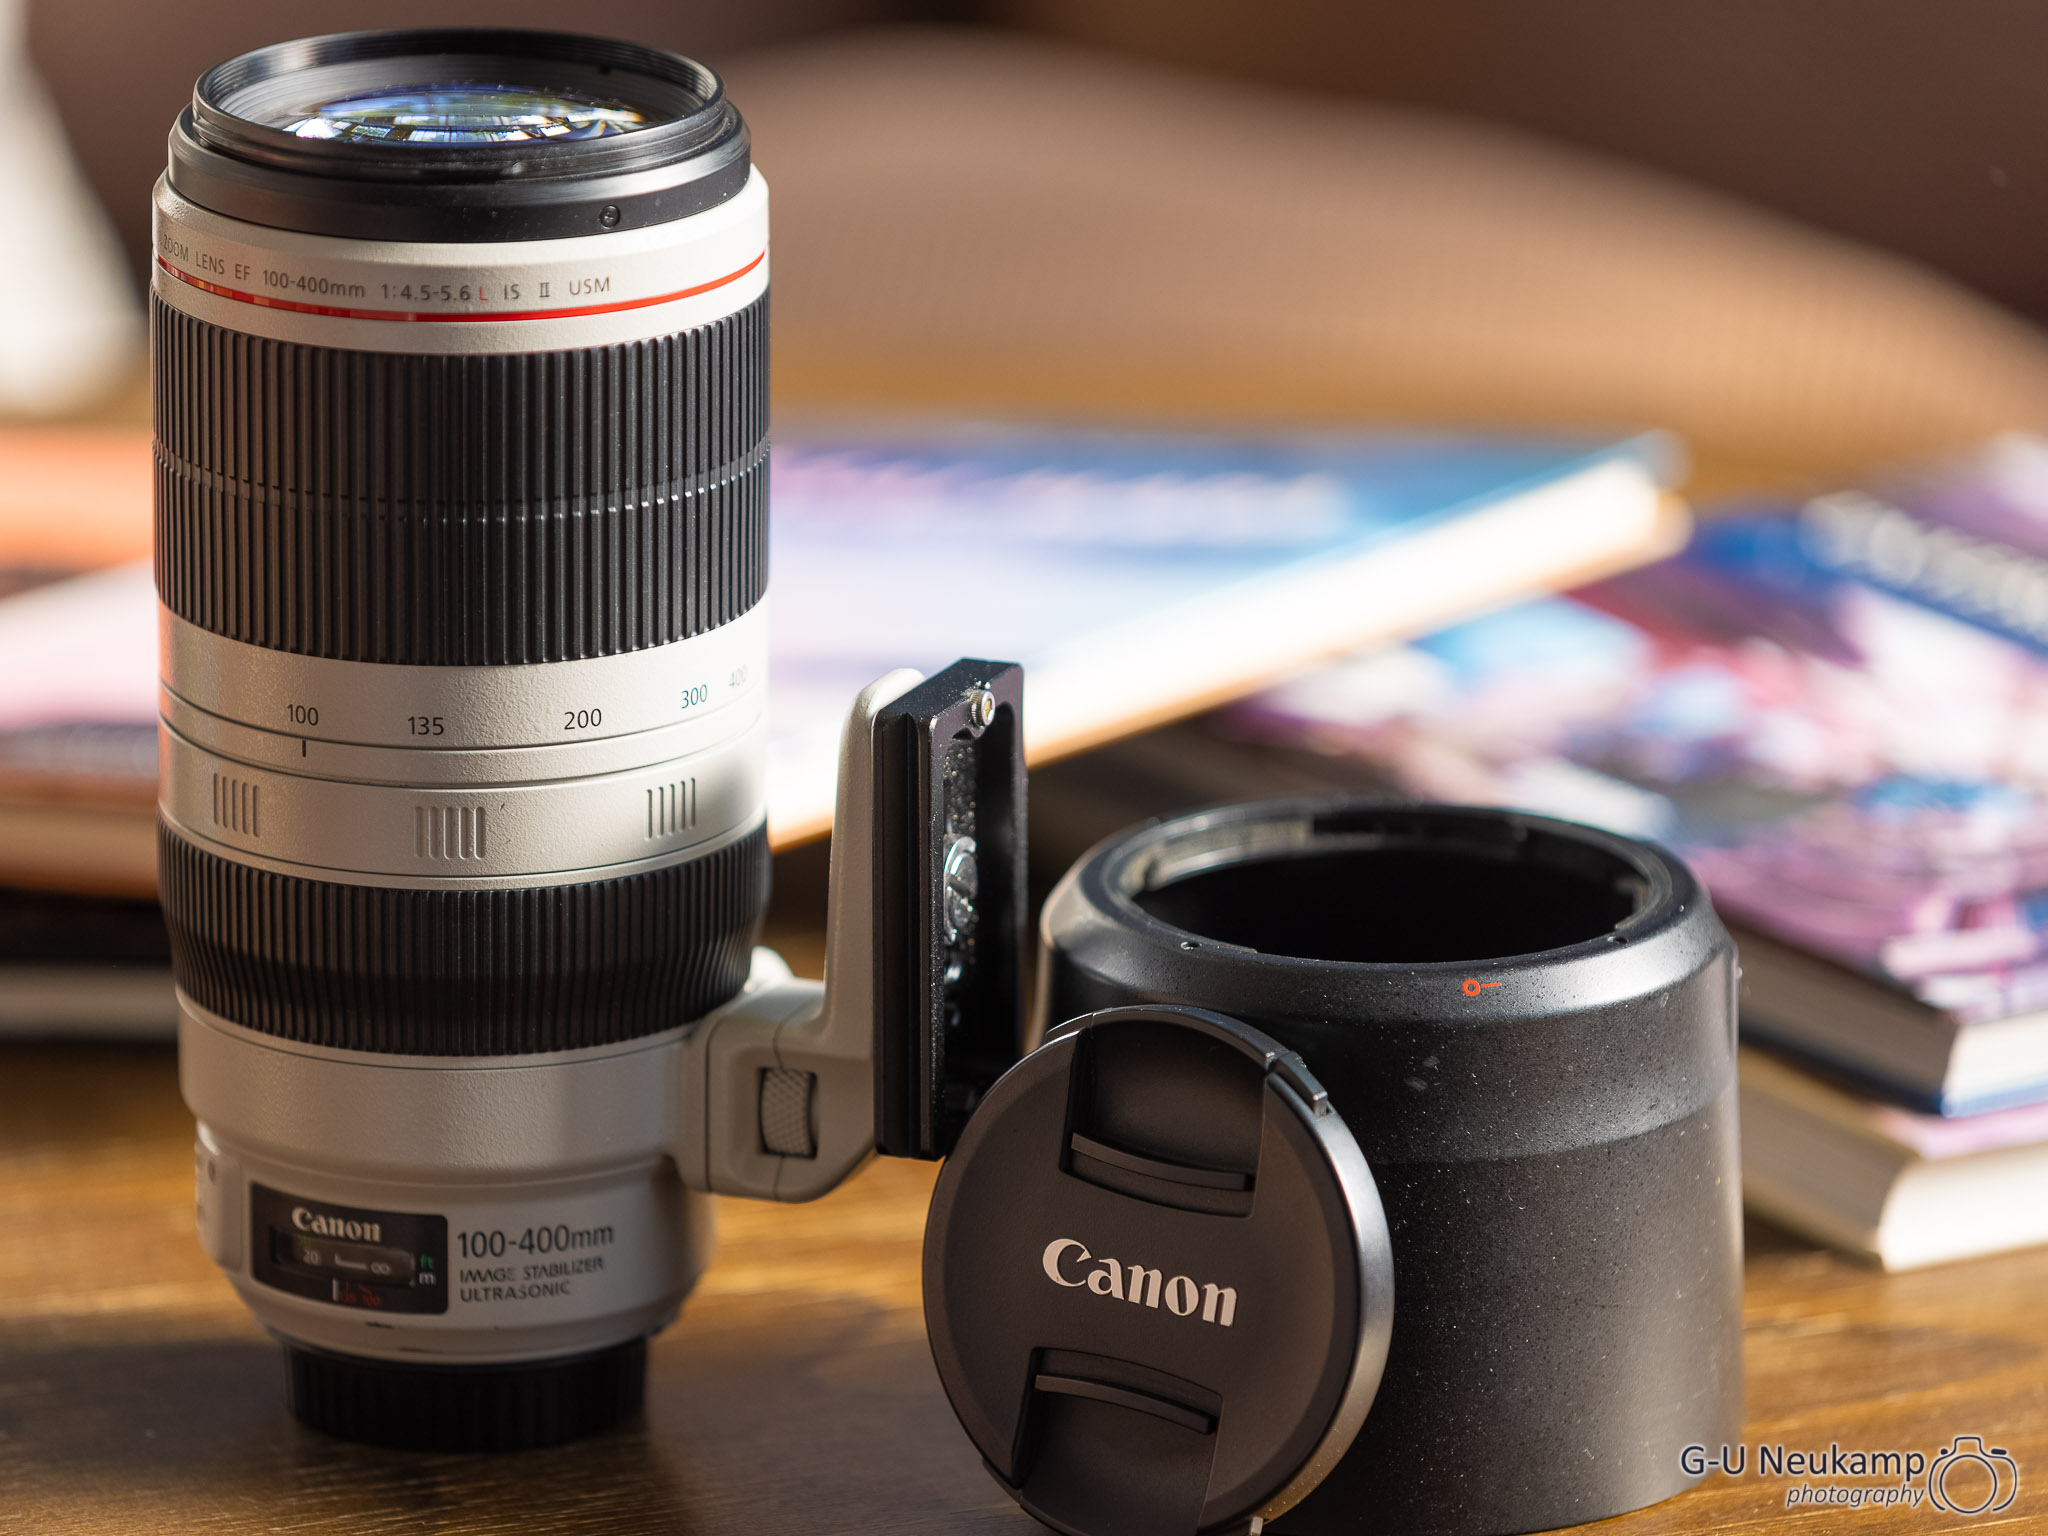 Read more about the article Der Canon EF-Mount lebt - das EF 100-400 f/4.5-5.6L IS II USM an der EOSR5